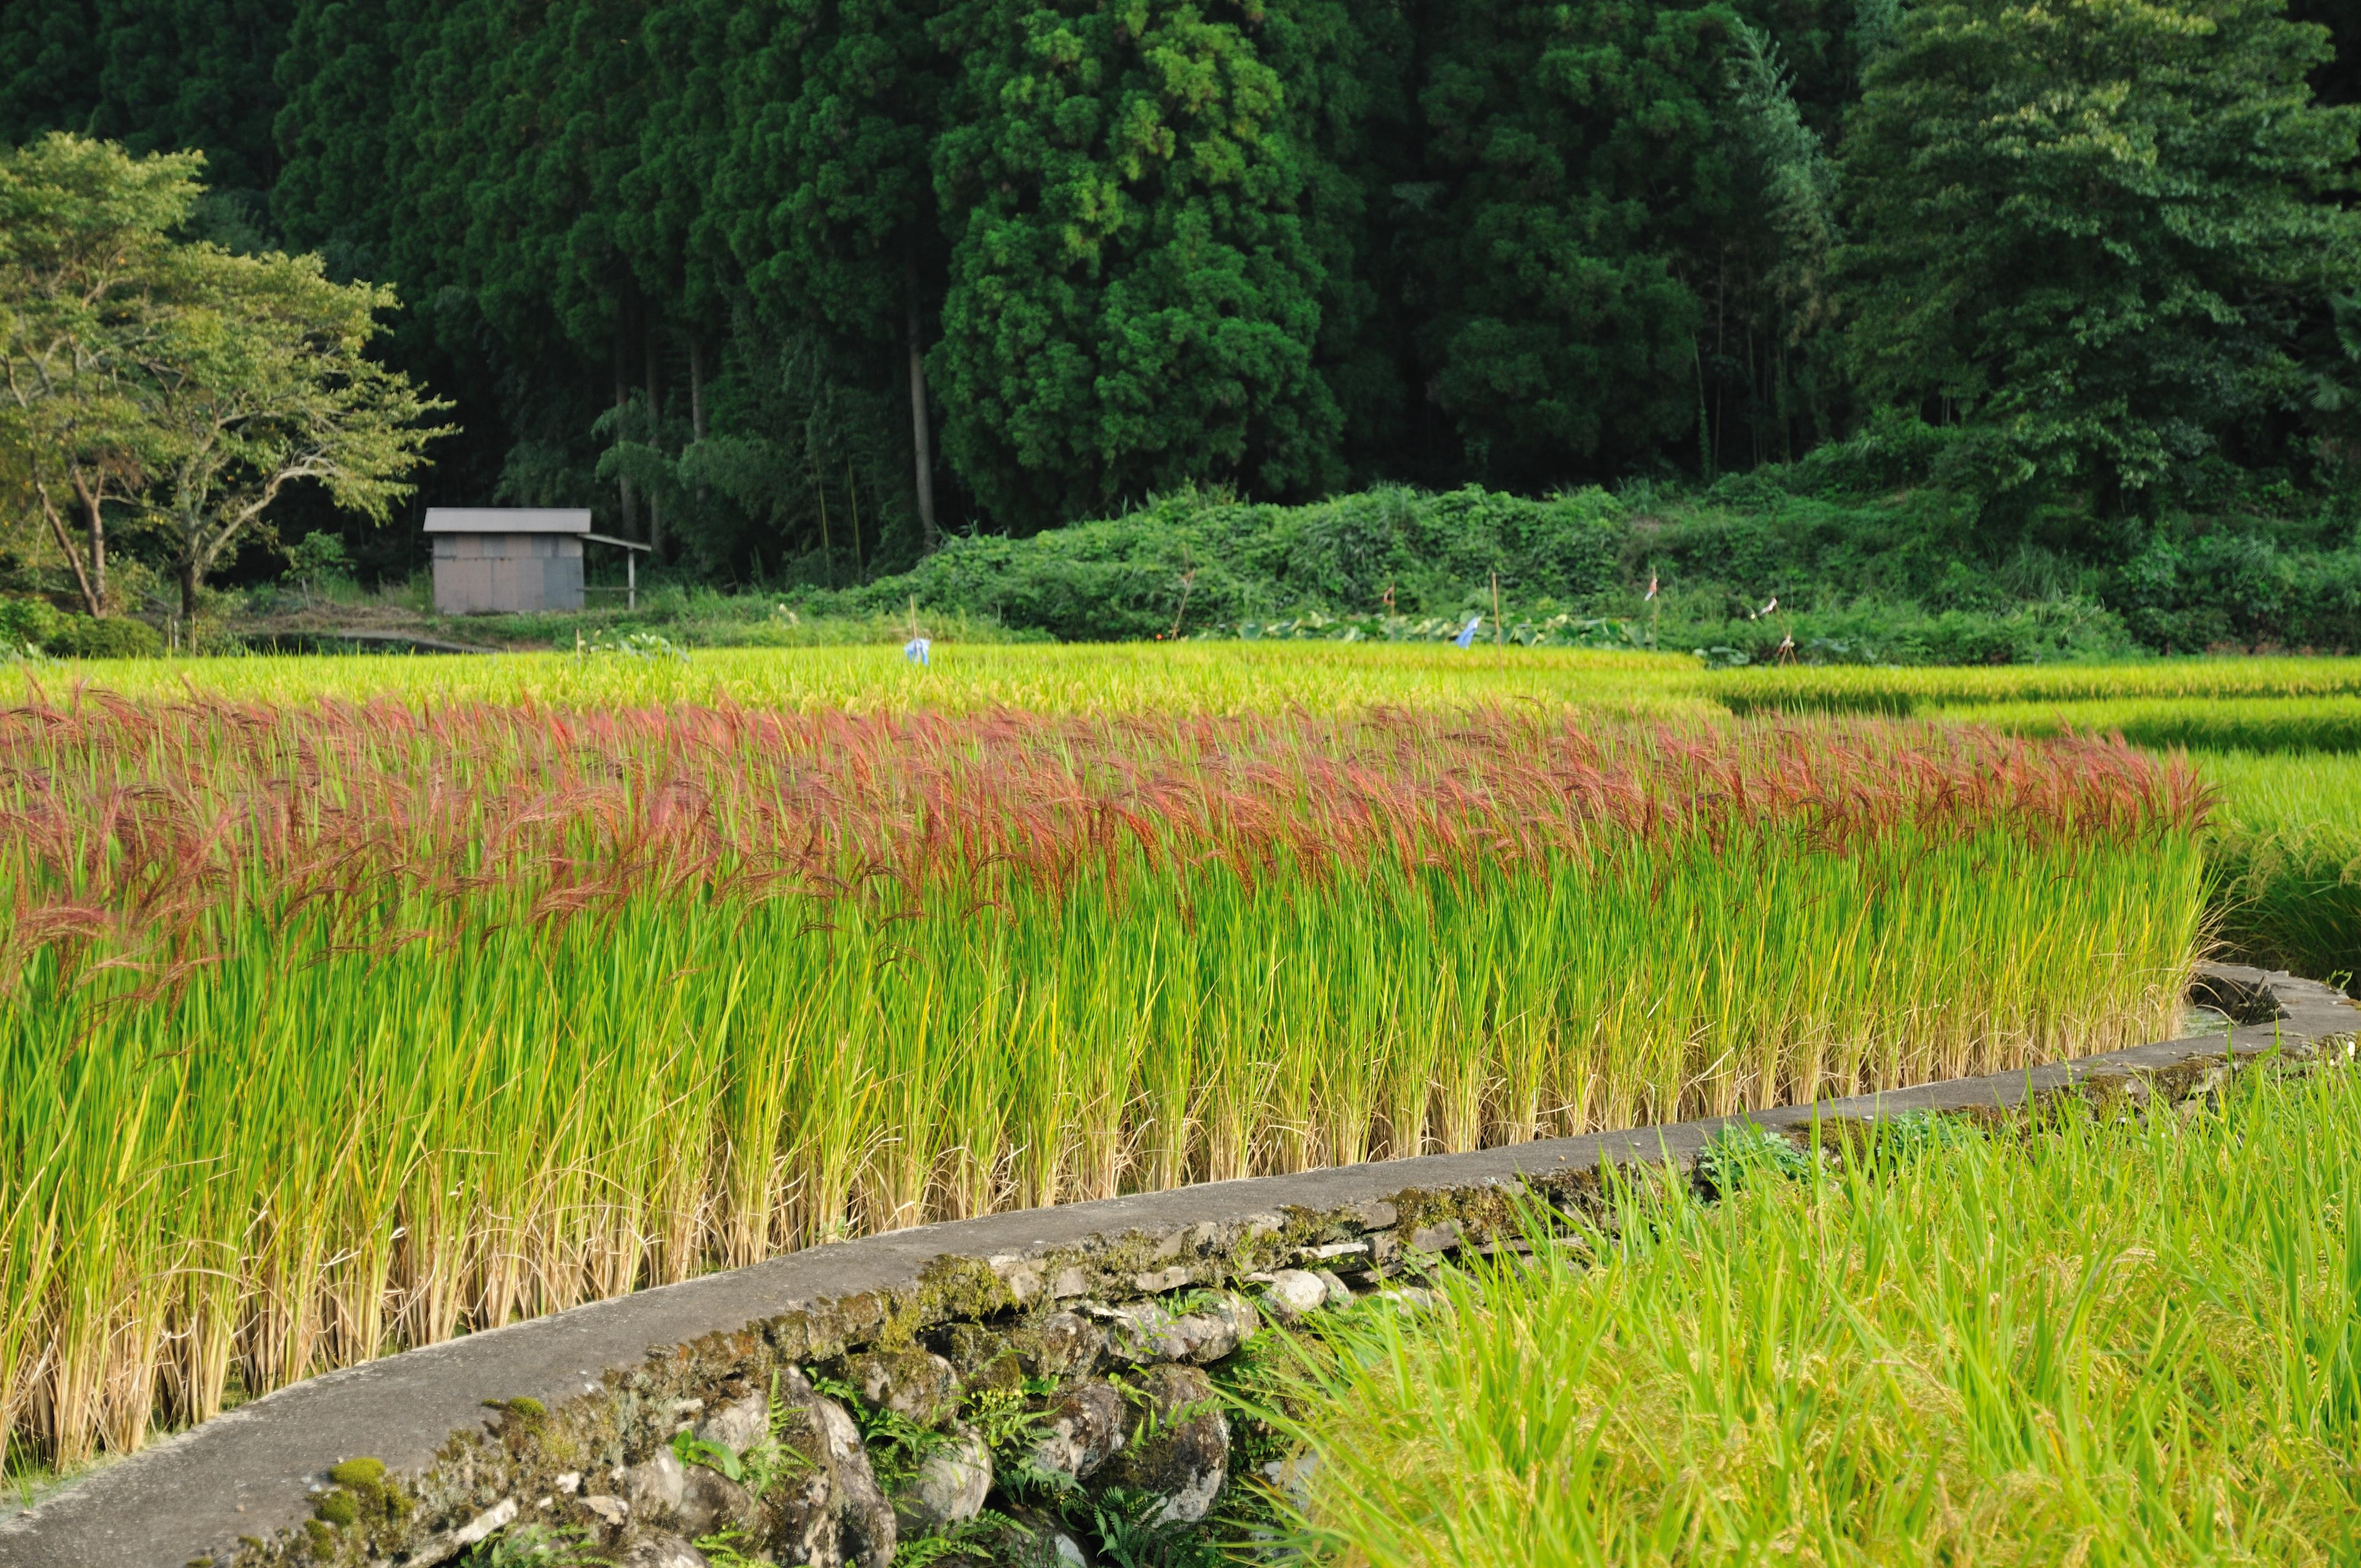 Description Red Rice Paddy field in Japan 006.jpg